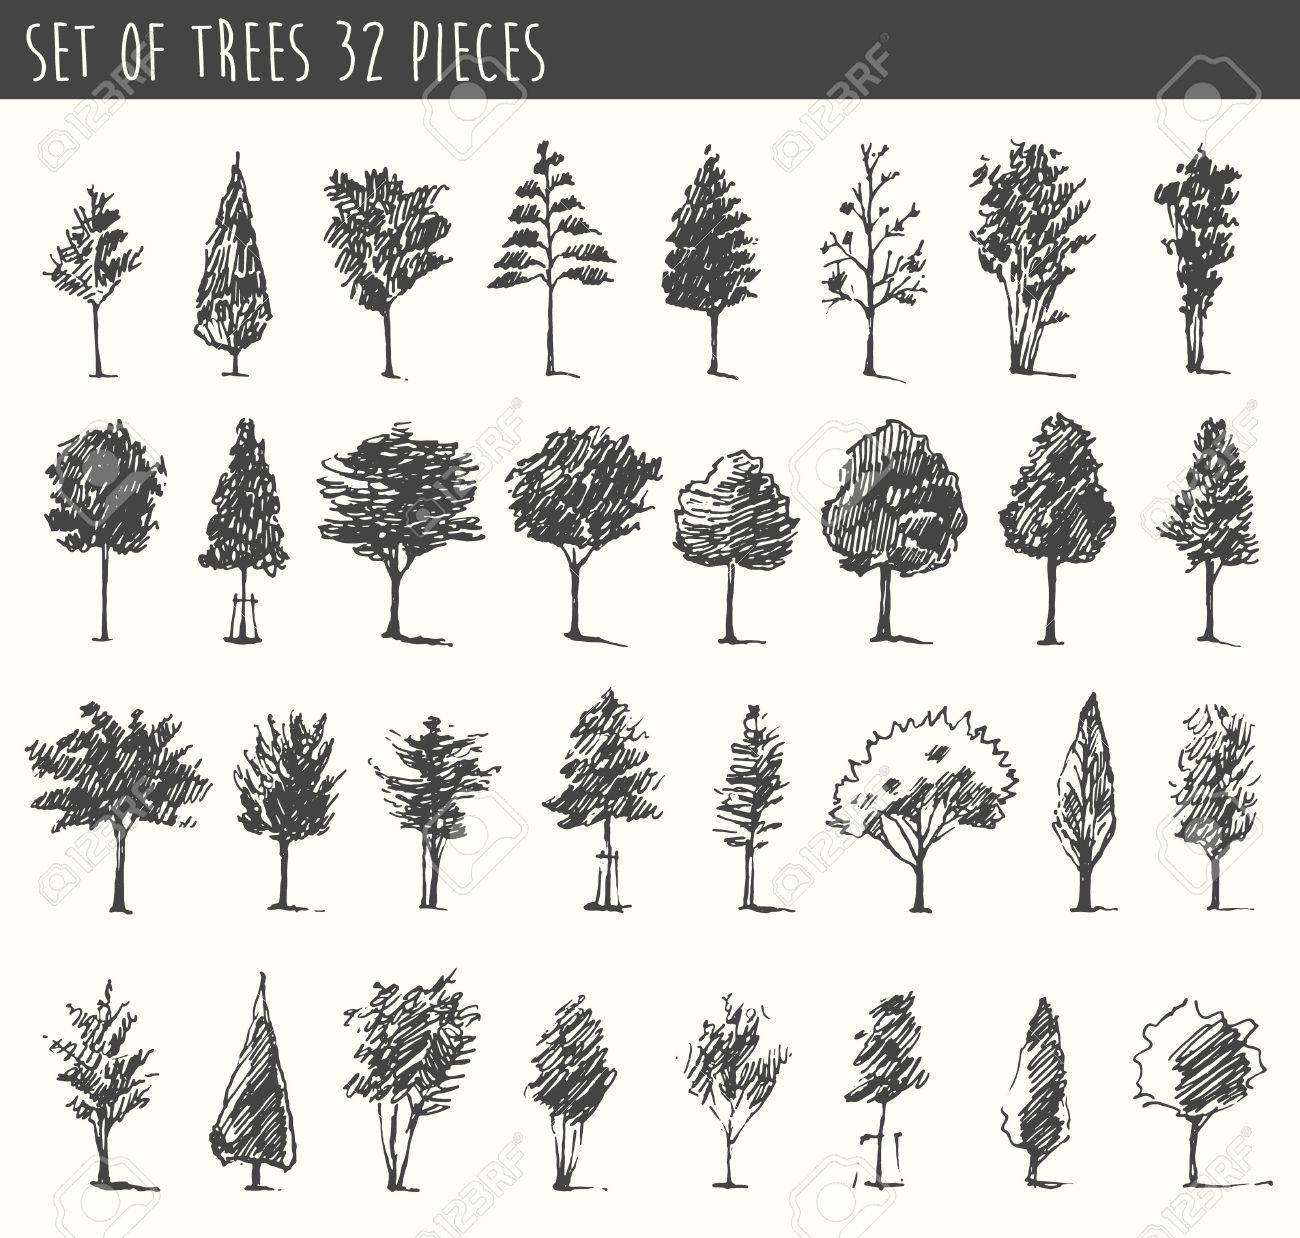 Trees sketch set vintage vector illustration engraved style trees sketch set vintage vector illustration engraved style hand drawn stock vector altavistaventures Gallery